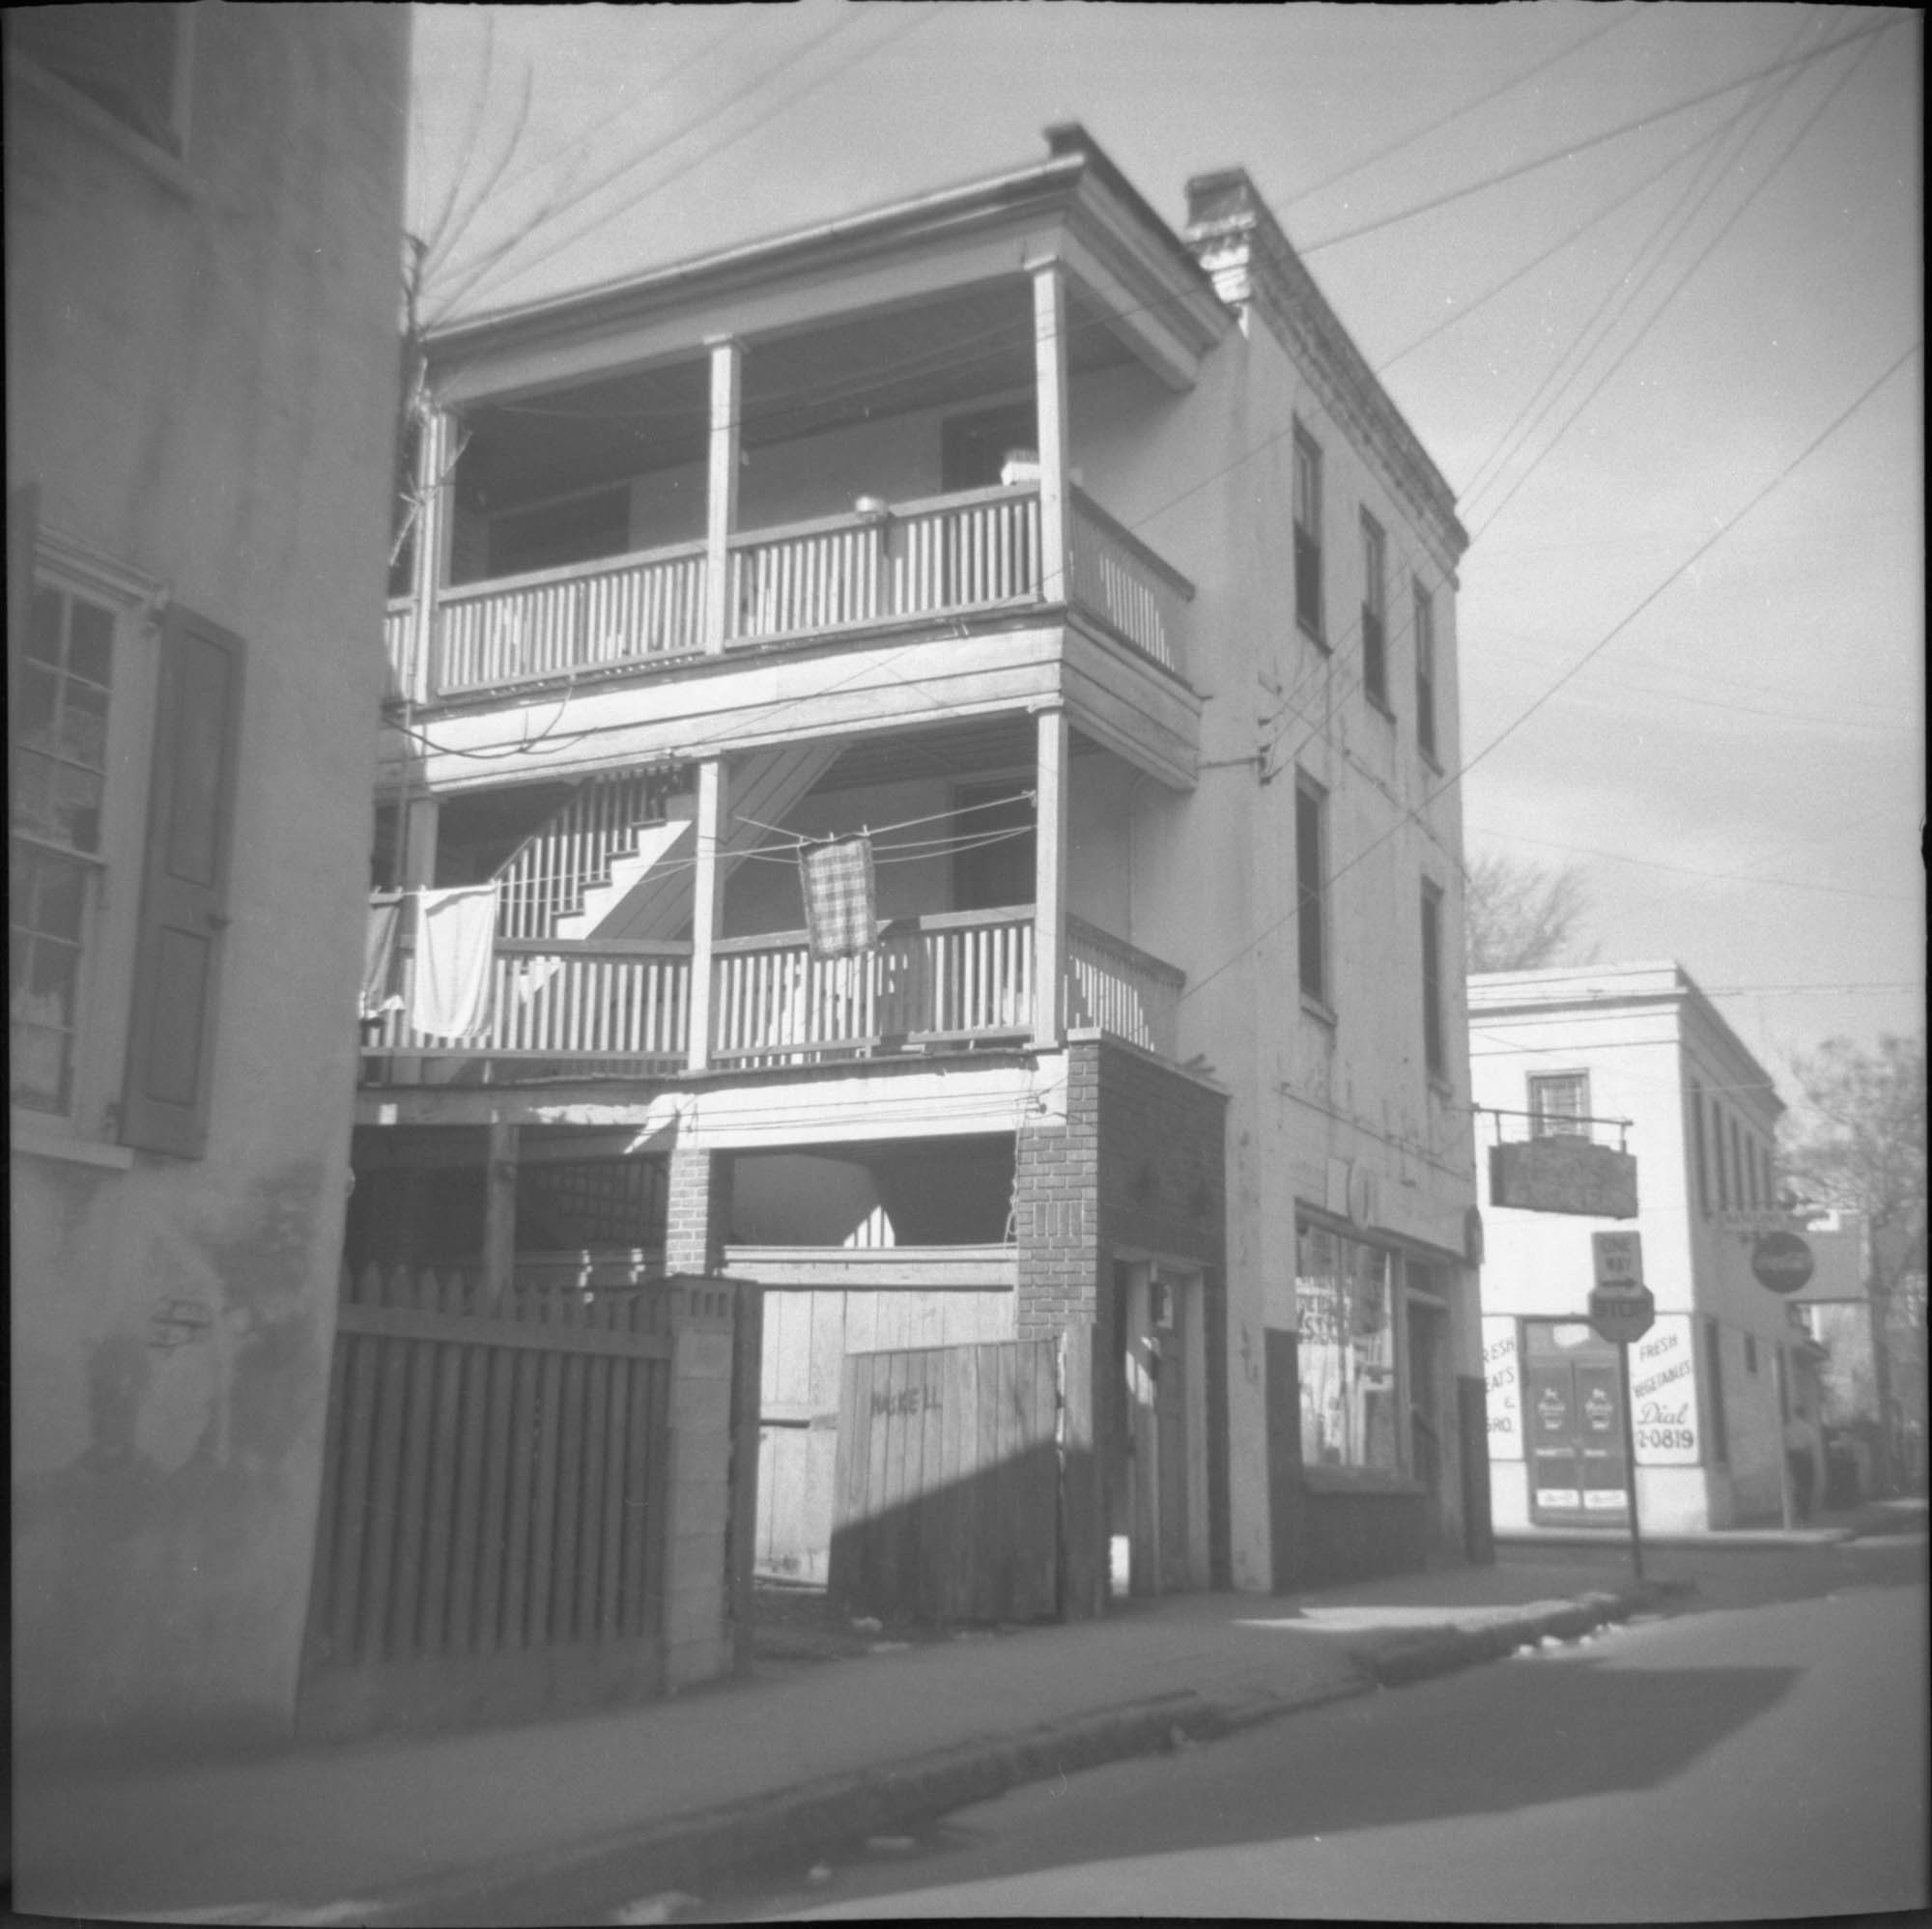 59 Anson Street